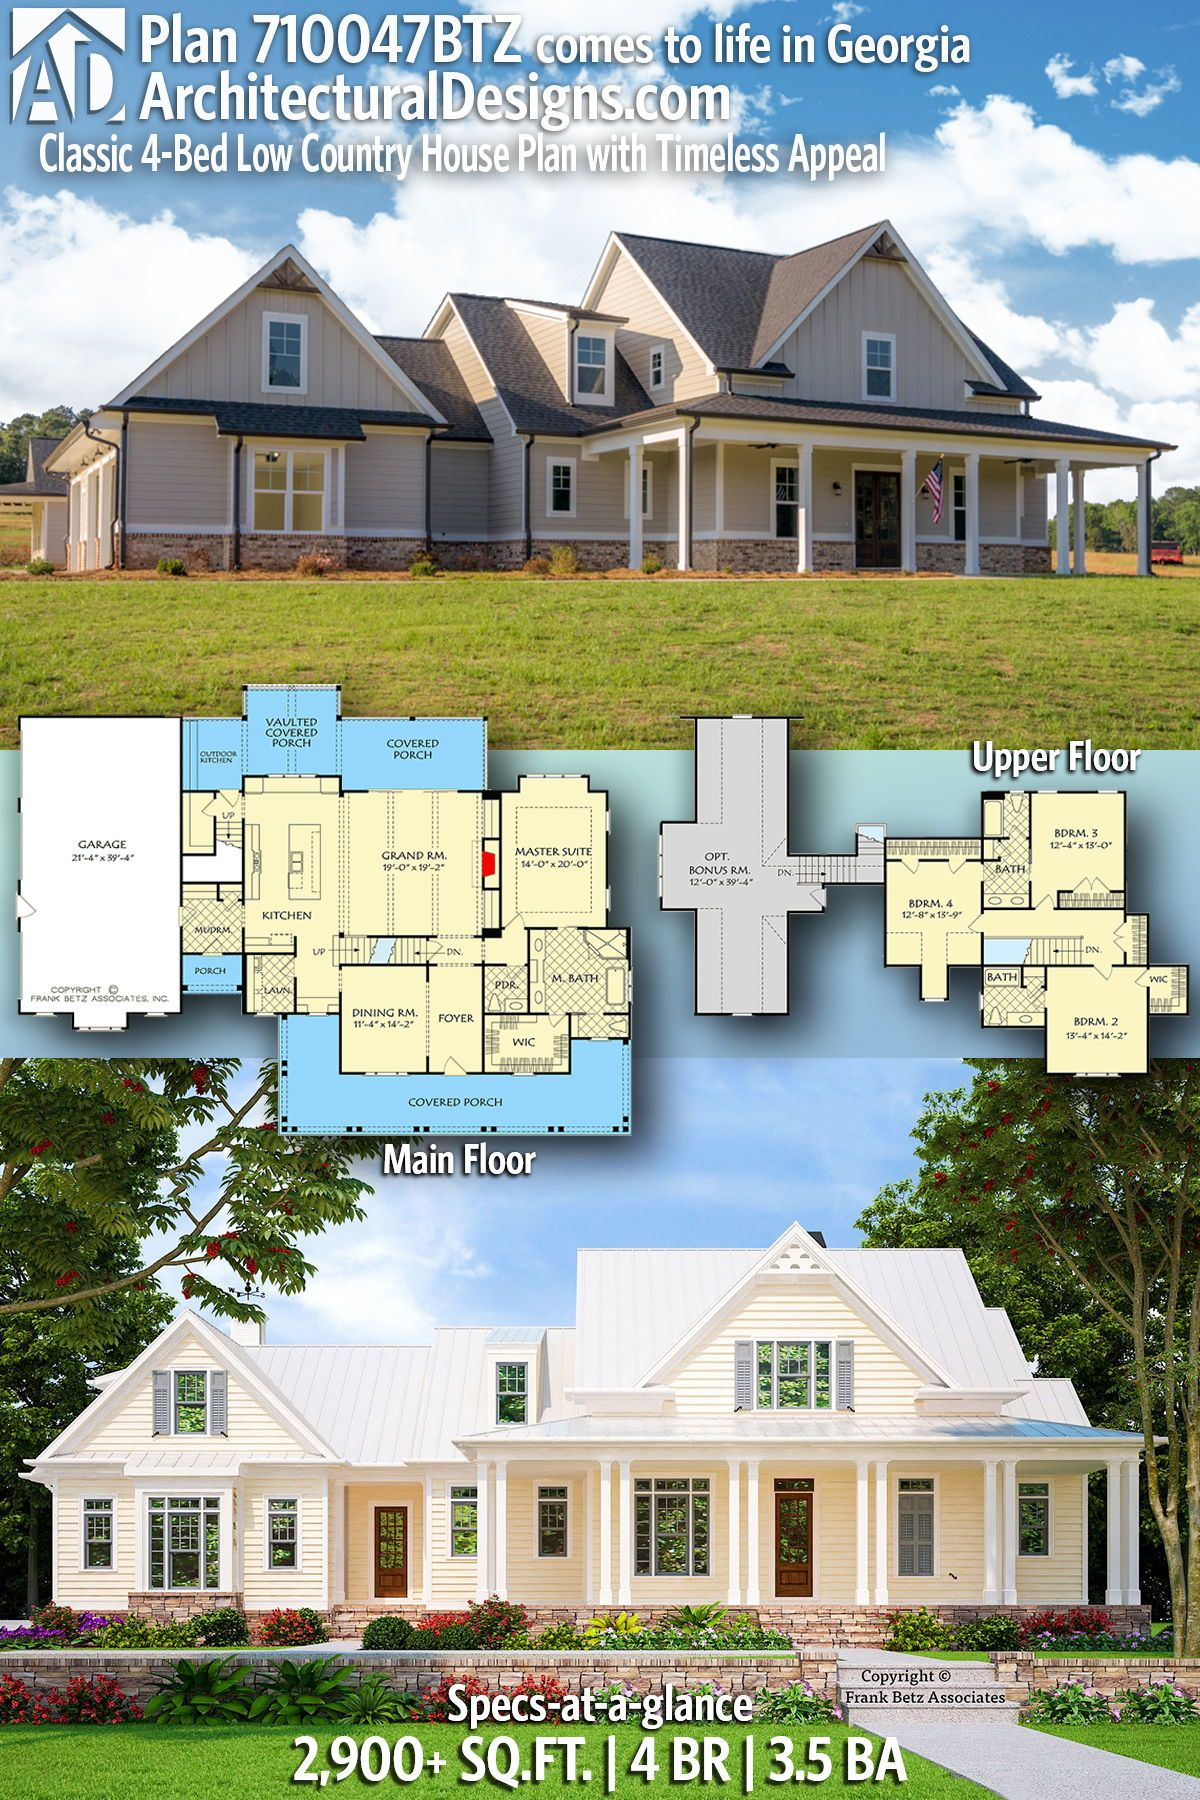 Plan 710047btz Classic 4 Bed Low Country House Plan With Timeless Appeal Country House Plan Country House Plans Architectural Design House Plans